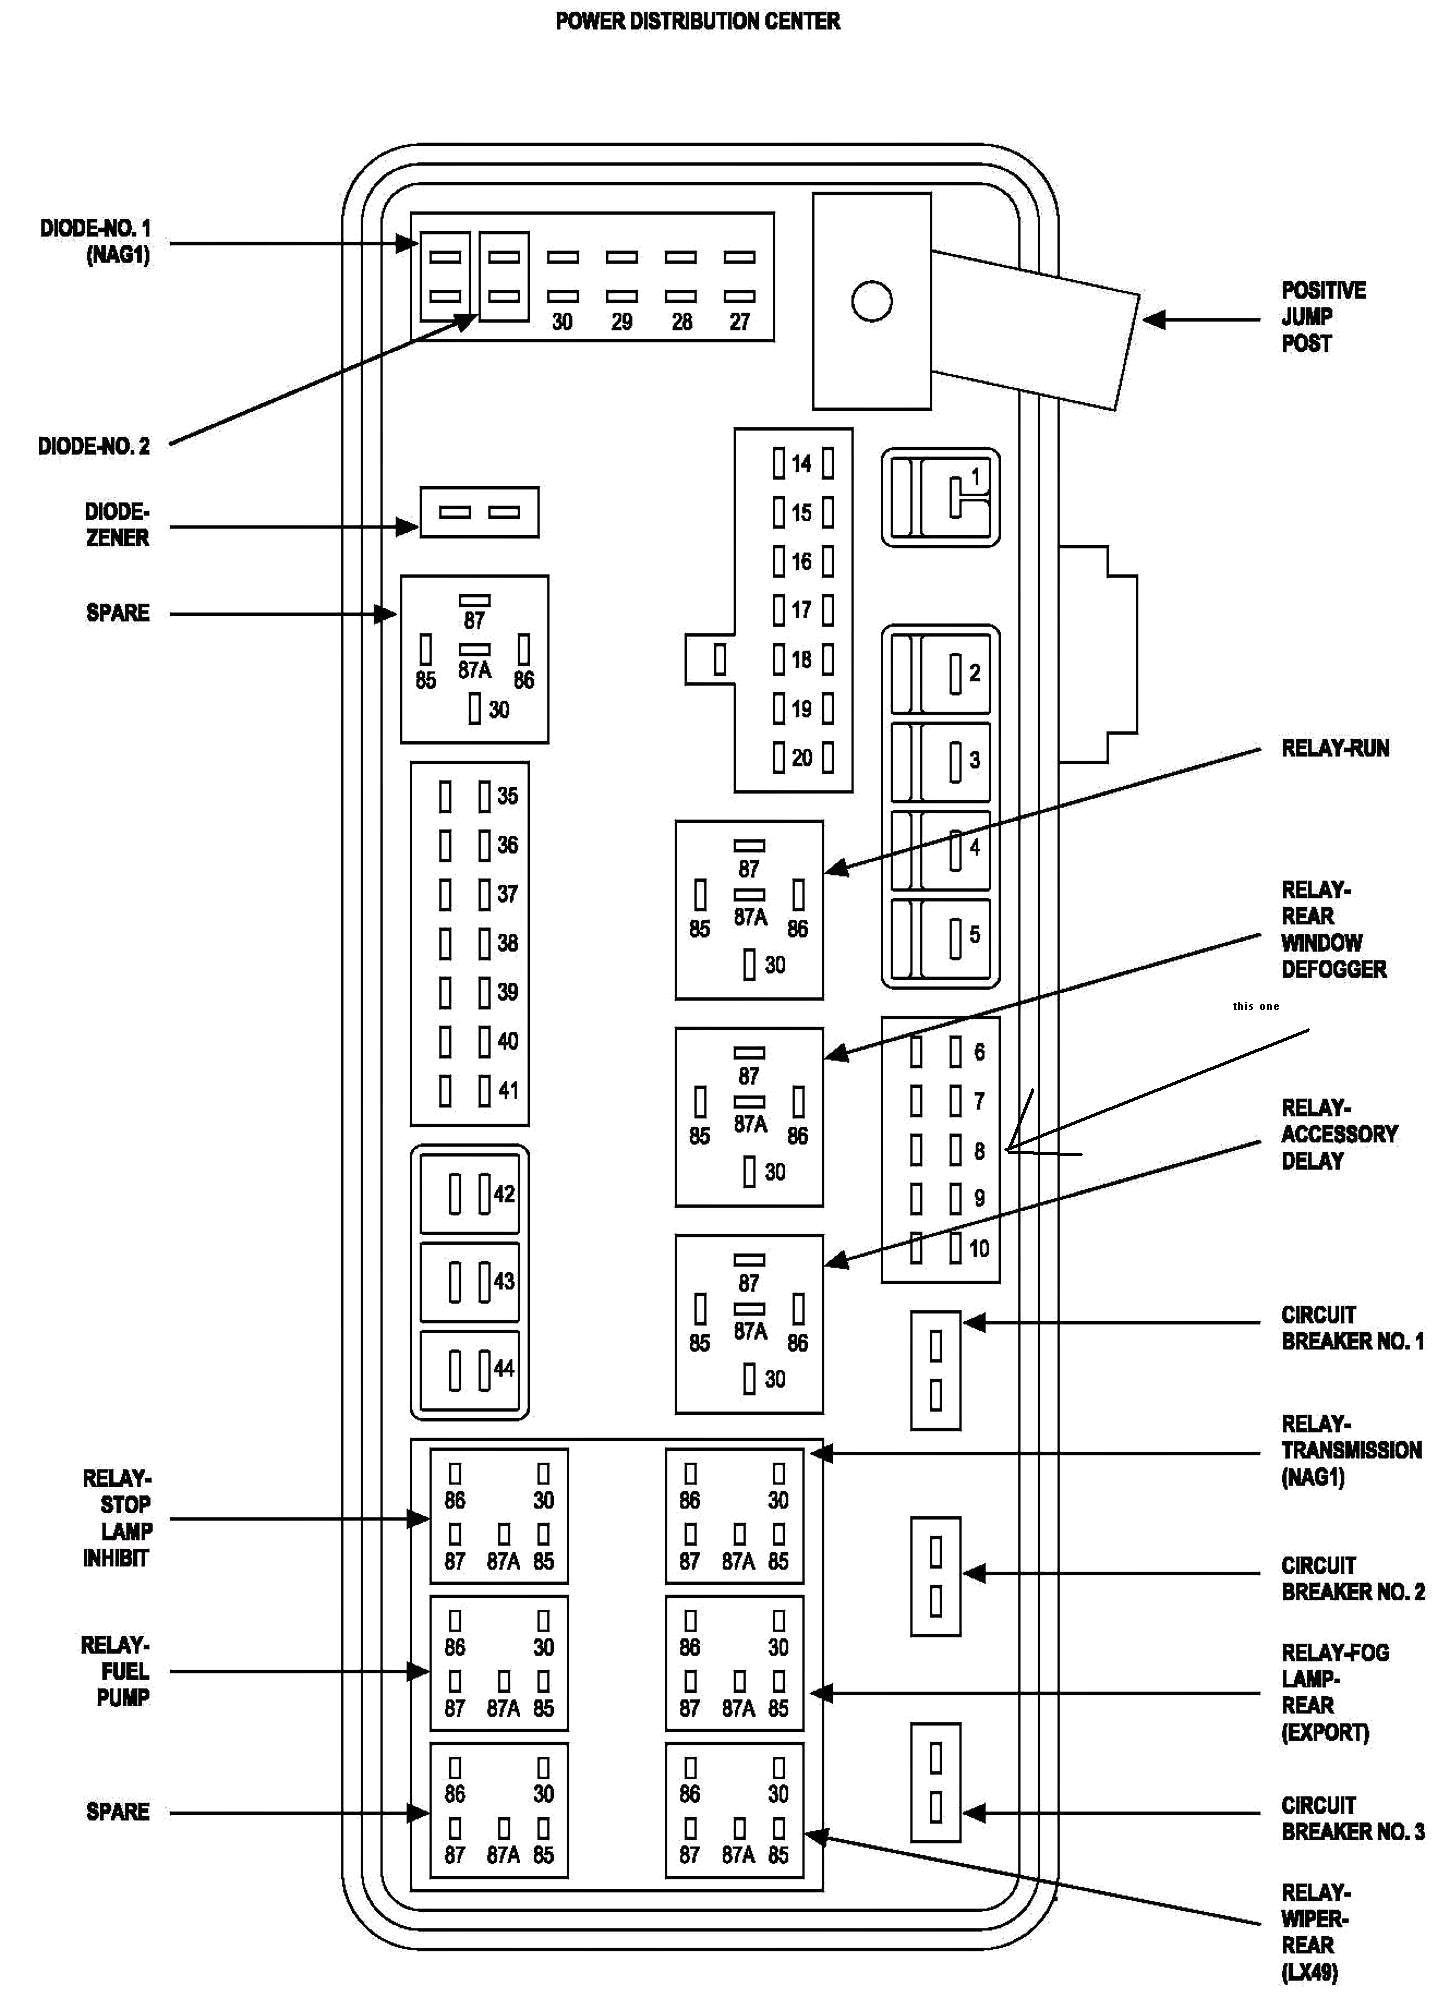 2014 dodge fuse box diagram blog wiring diagram 2014 dodge ram 1500 fuse diagram wiring diagrams